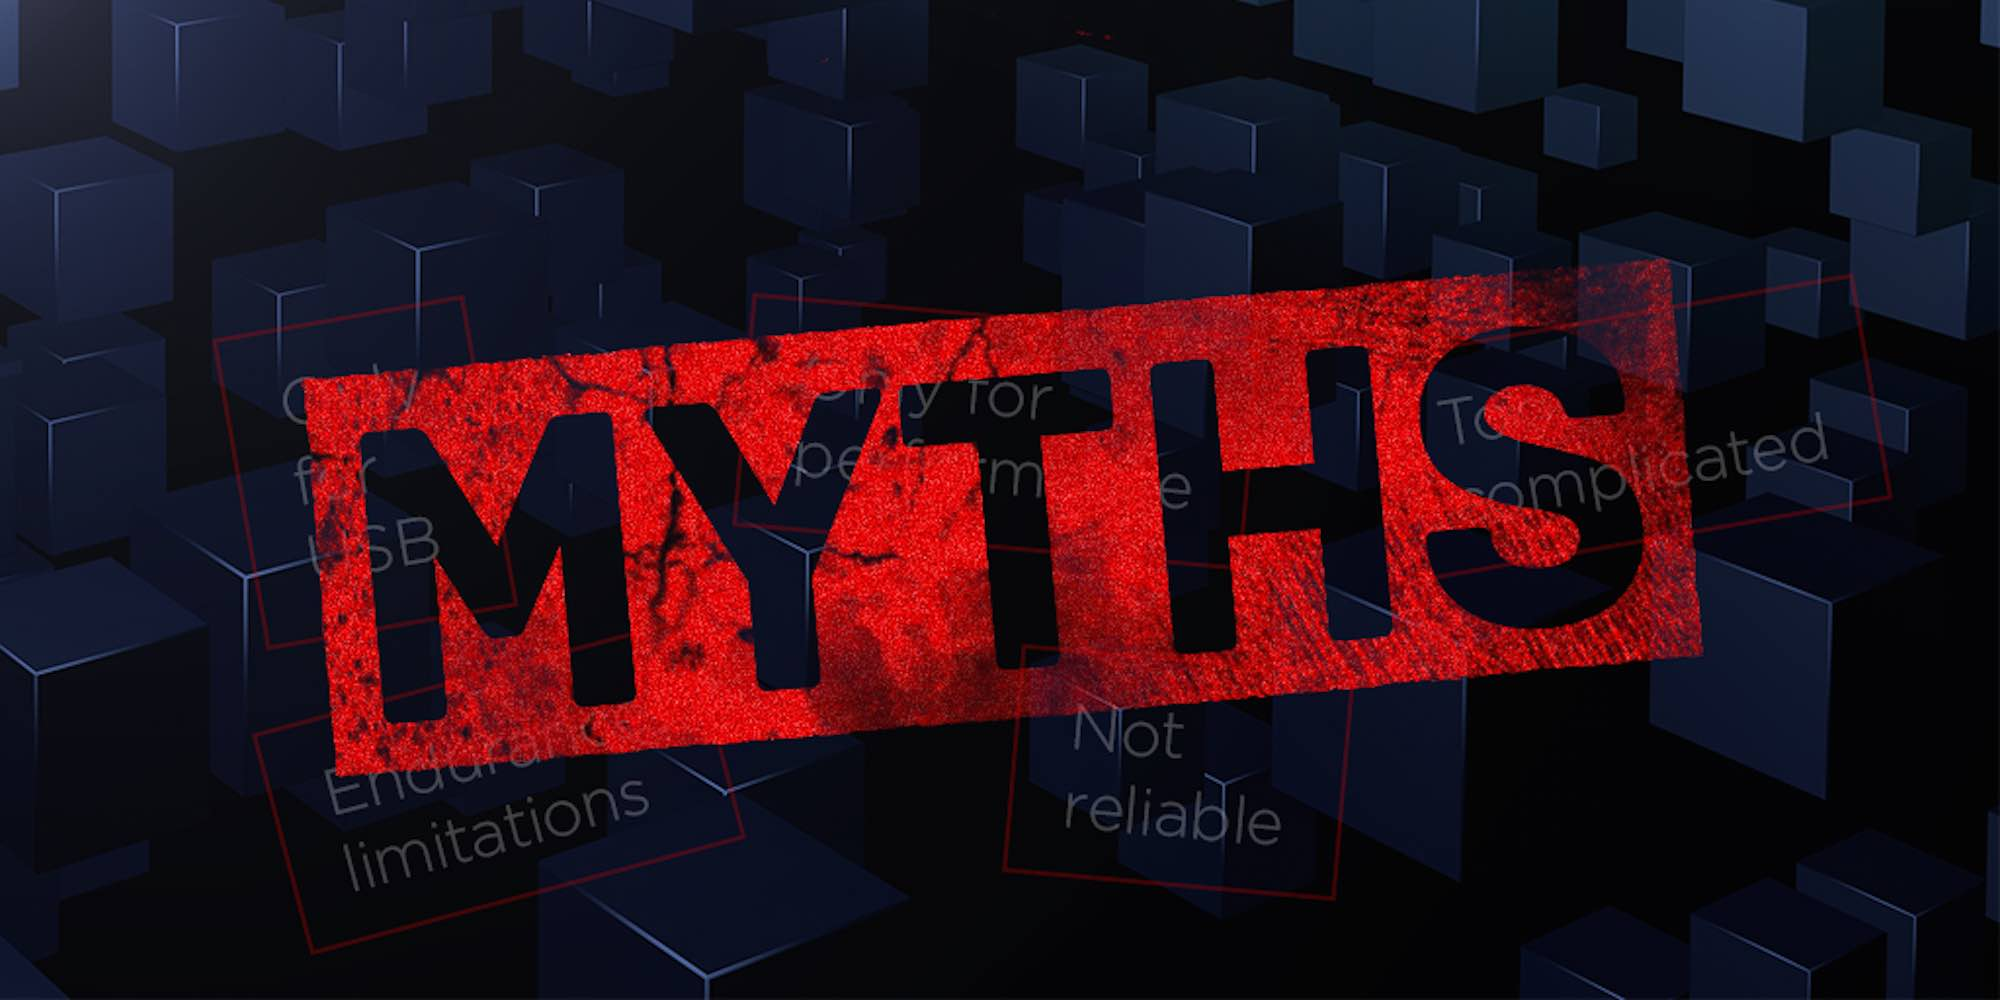 5 Myths of Enterprise Flash